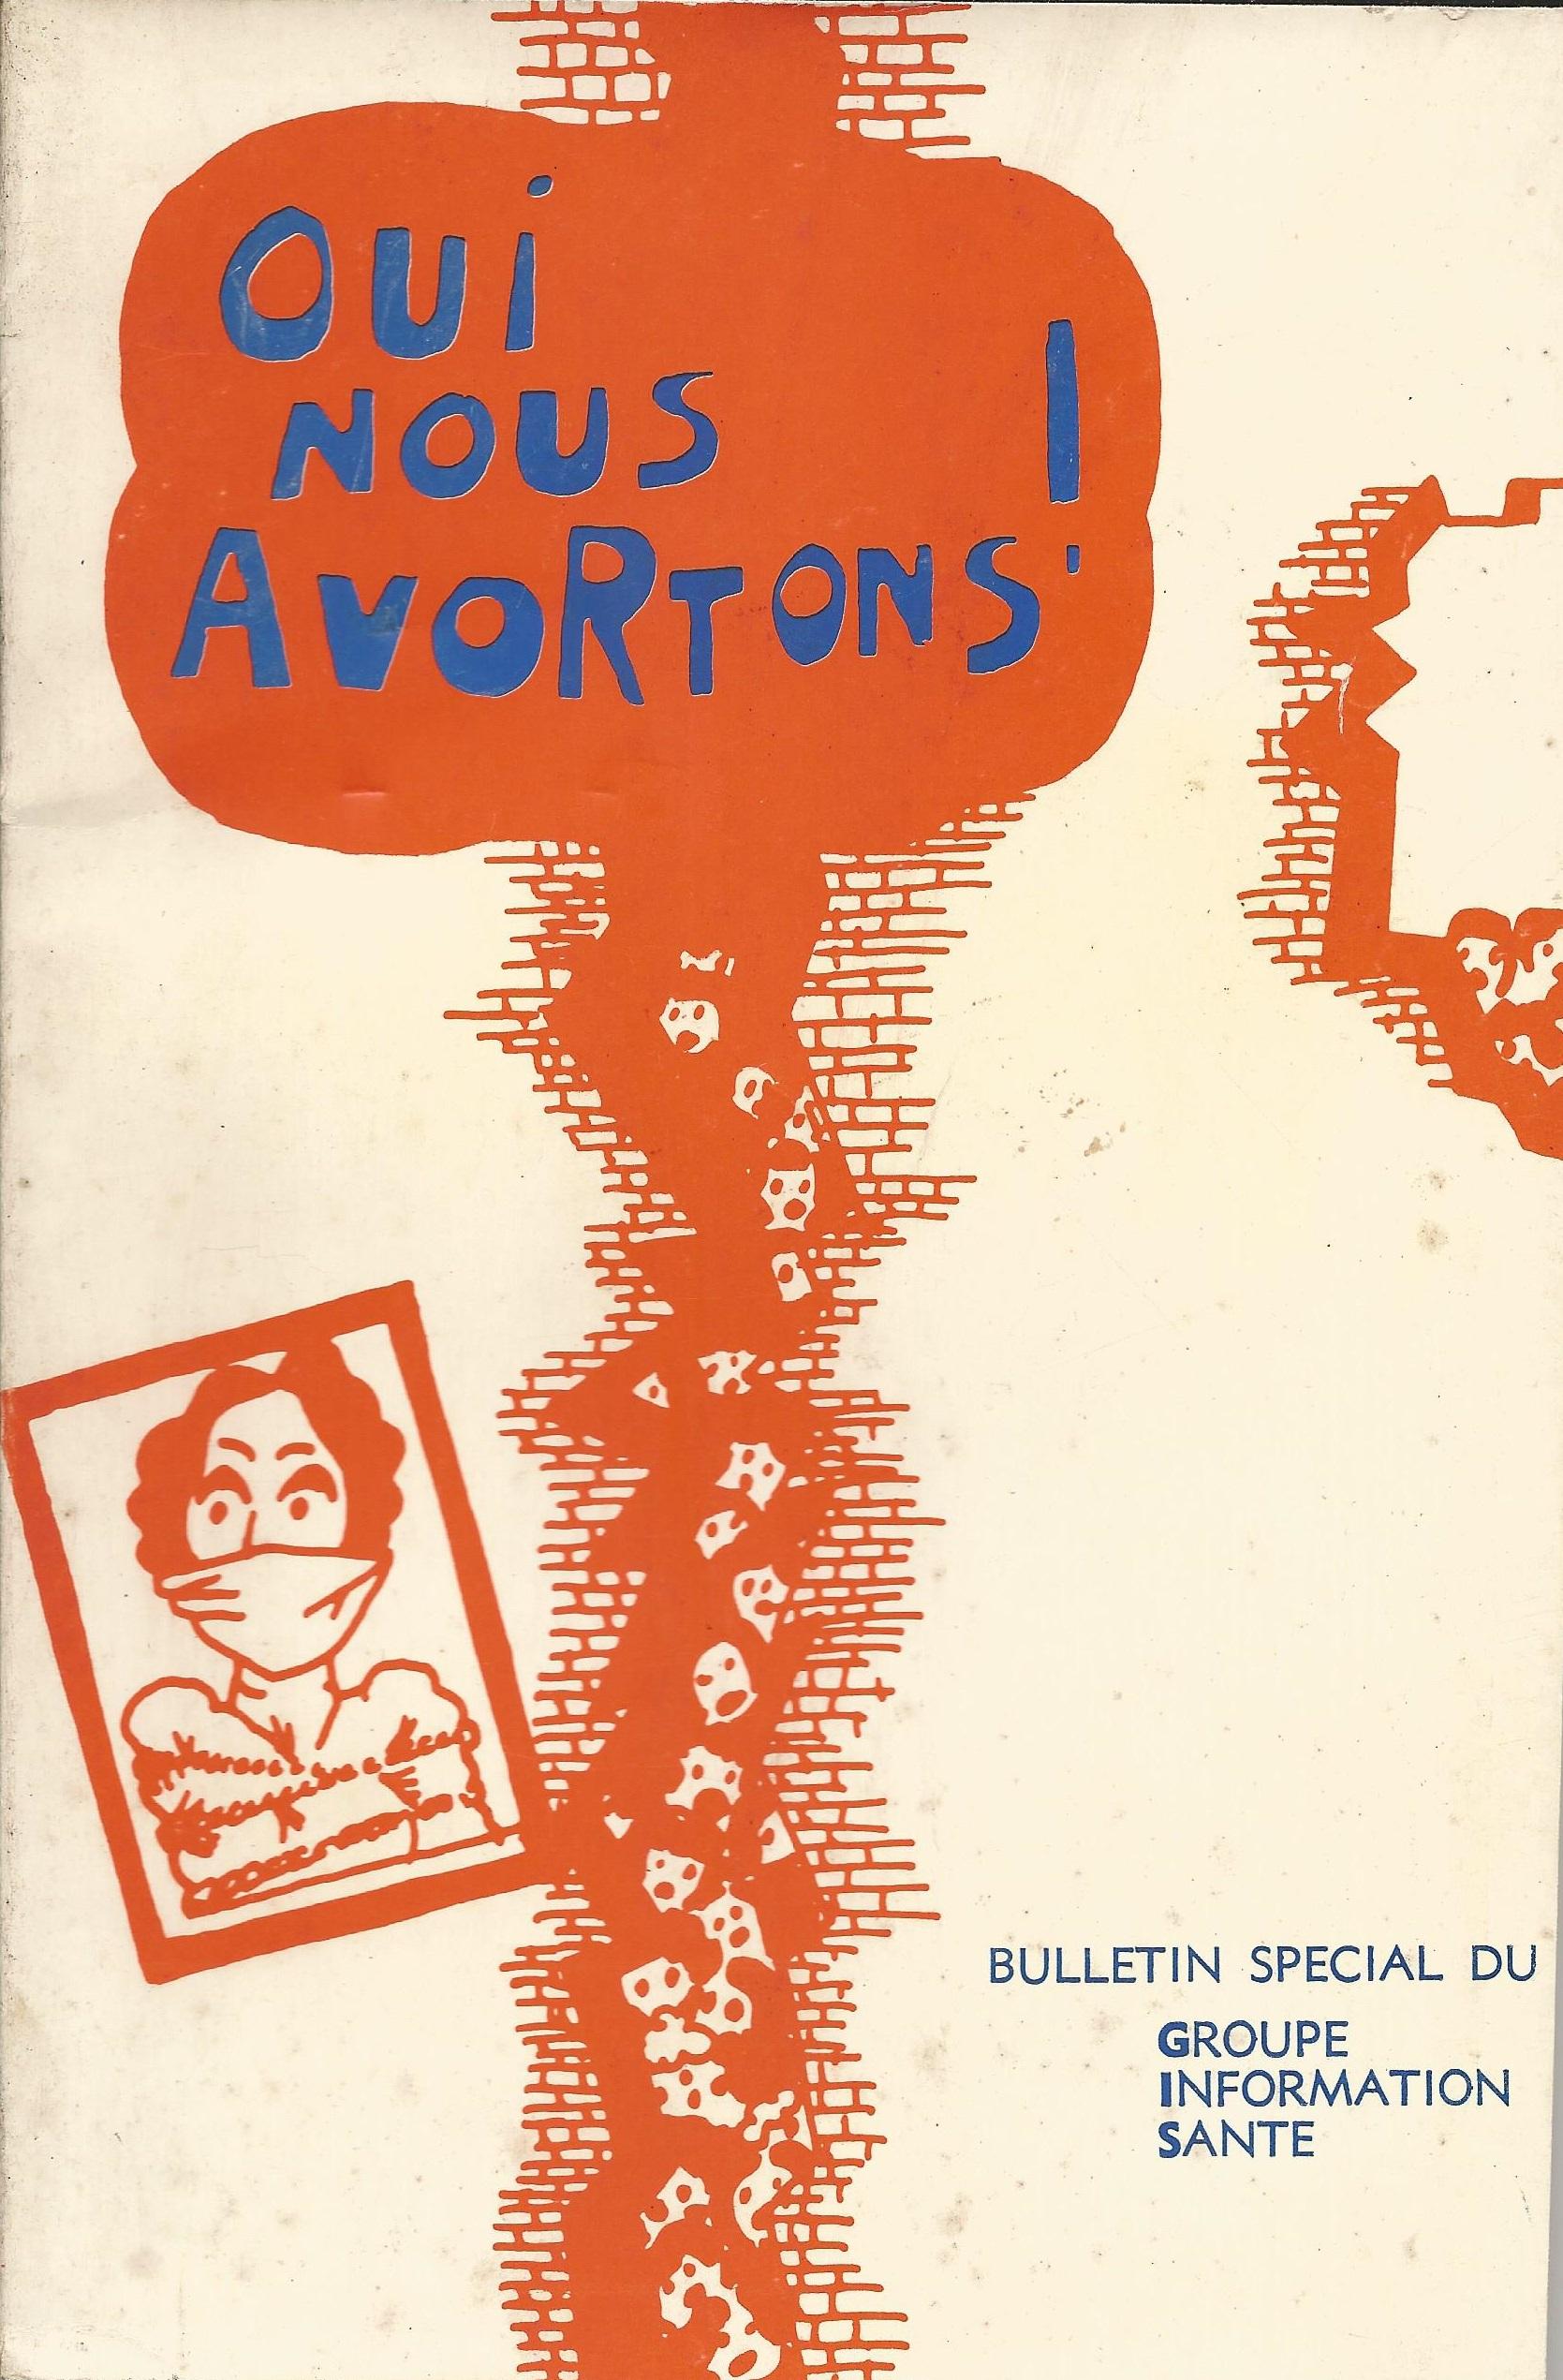 Foucault and the Groupe Information Santé – a bibliography